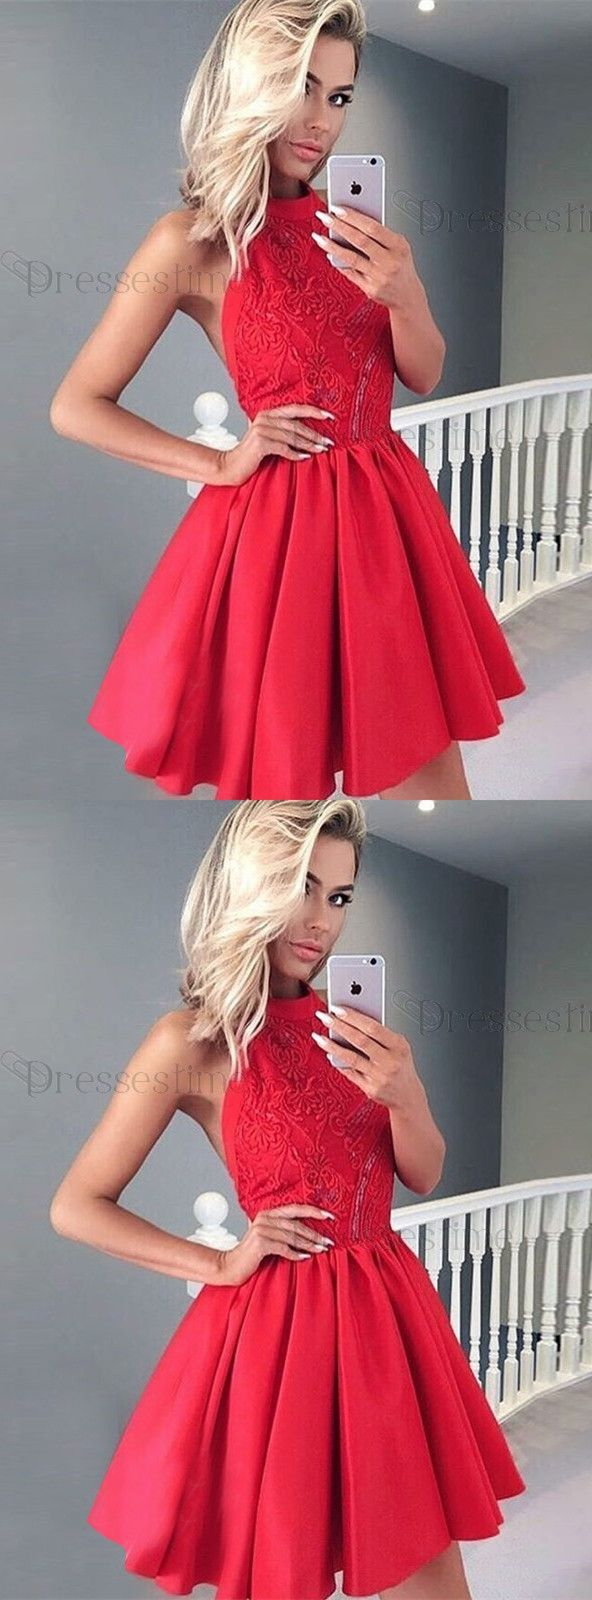 best dresses images on pinterest short prom dresses appliques